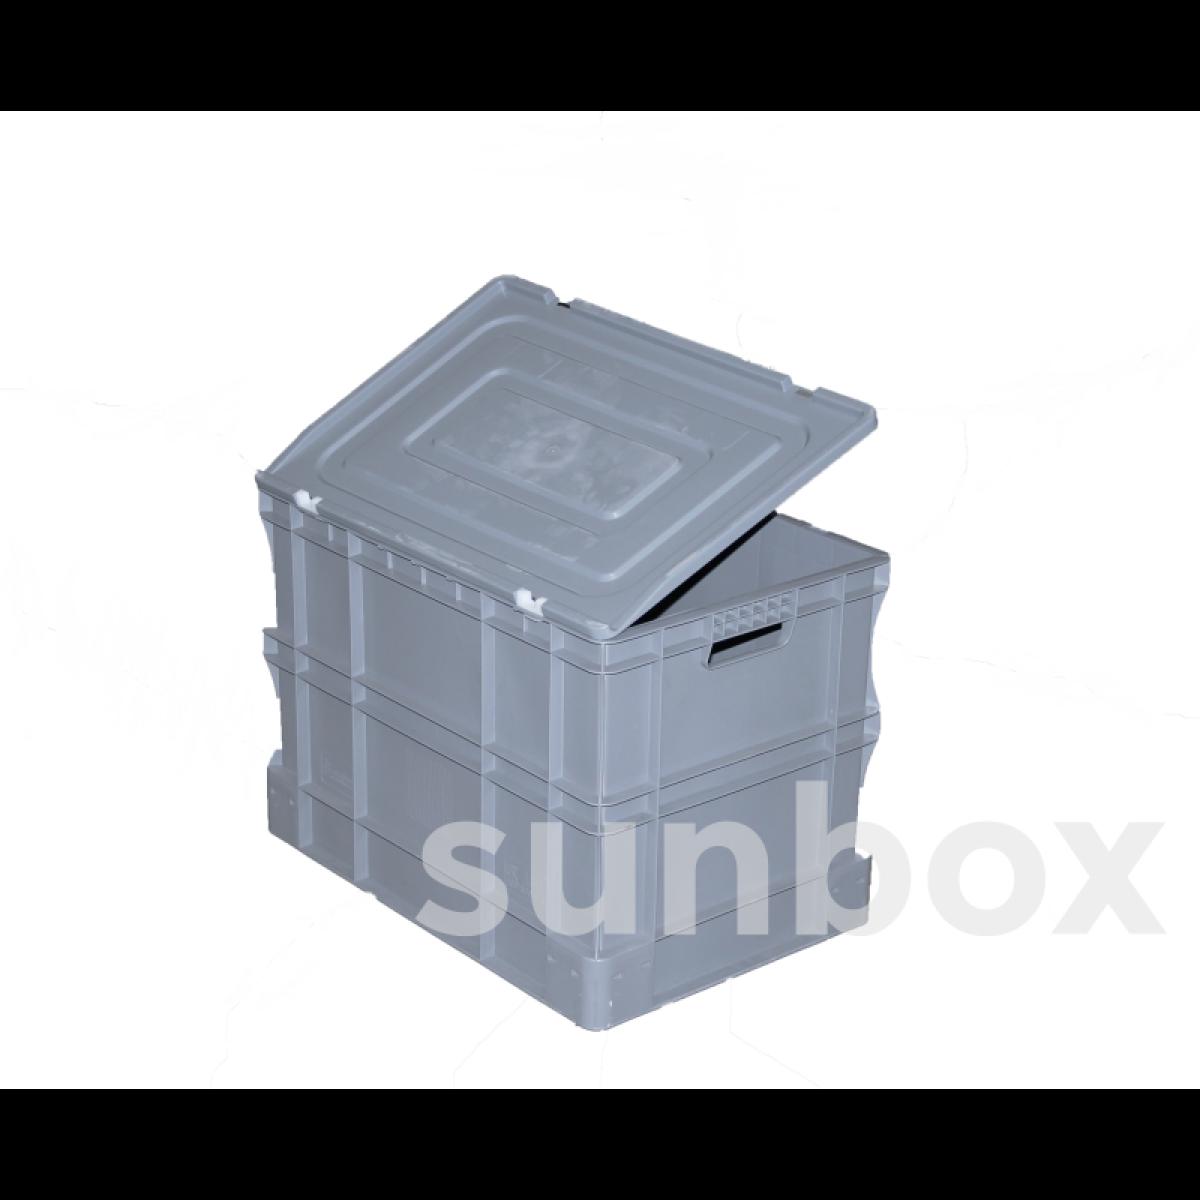 sunbox_prod_2